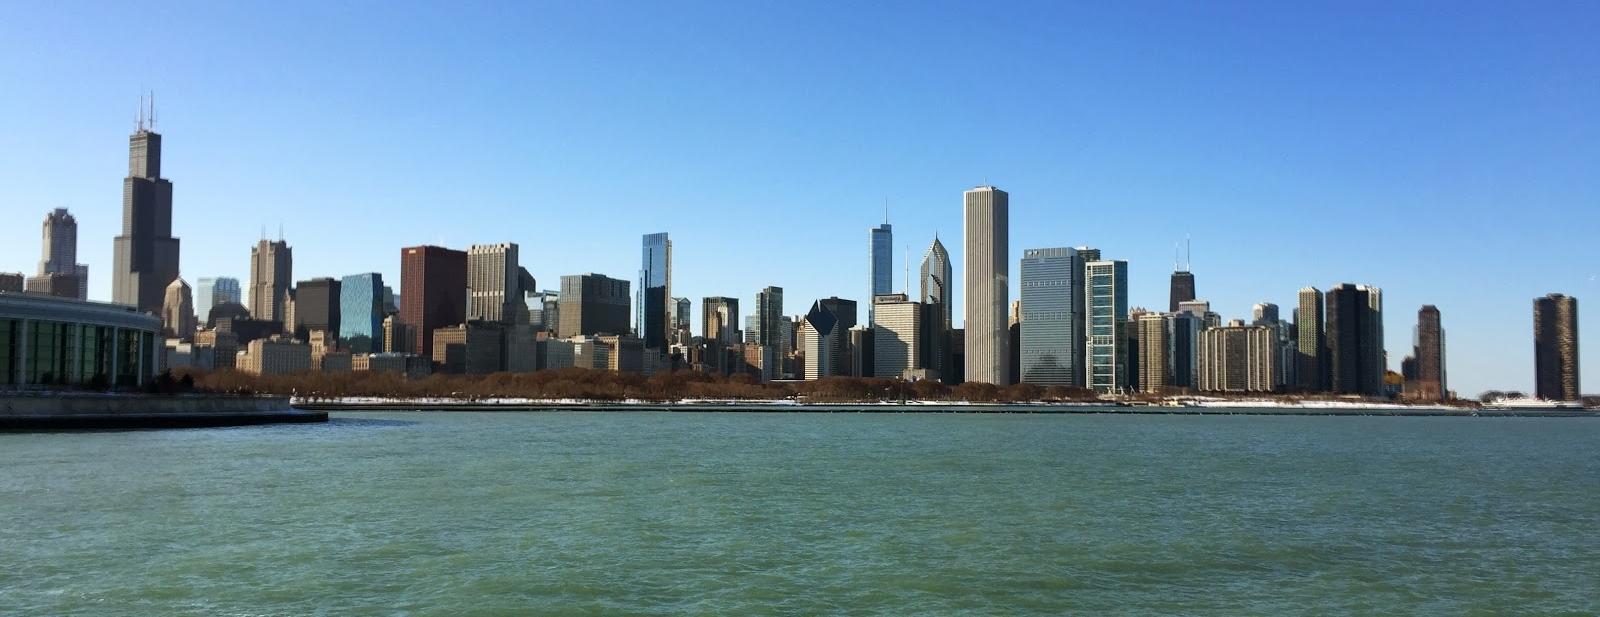 Chicago's iconic skyline.